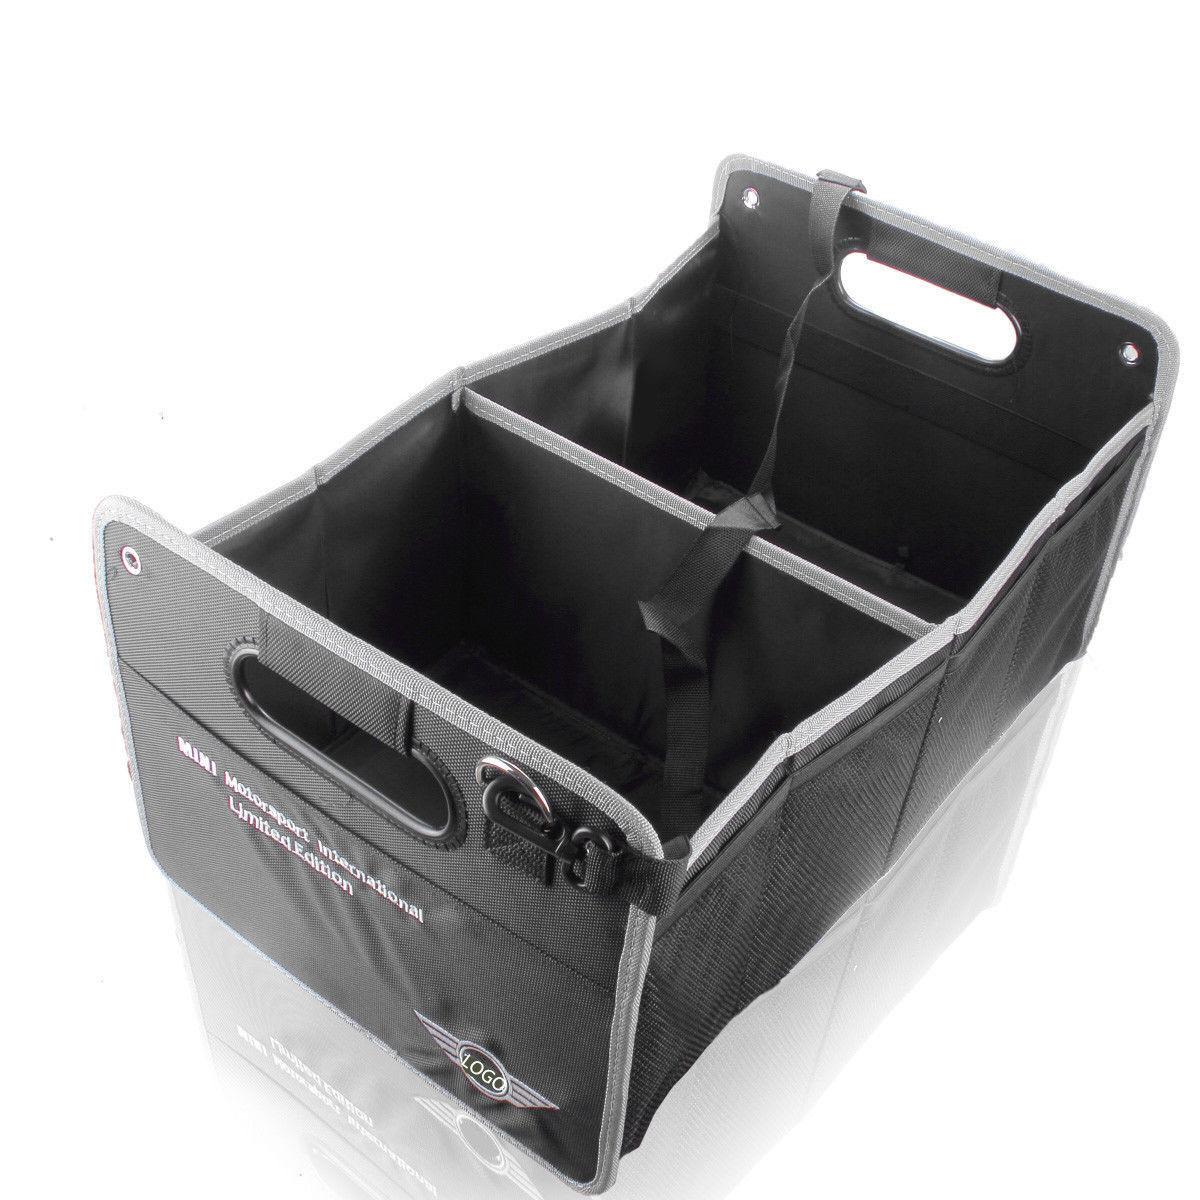 Folding Wing Emblem Car Trunk Soft Storage Organizer Folding for Mini Cooper